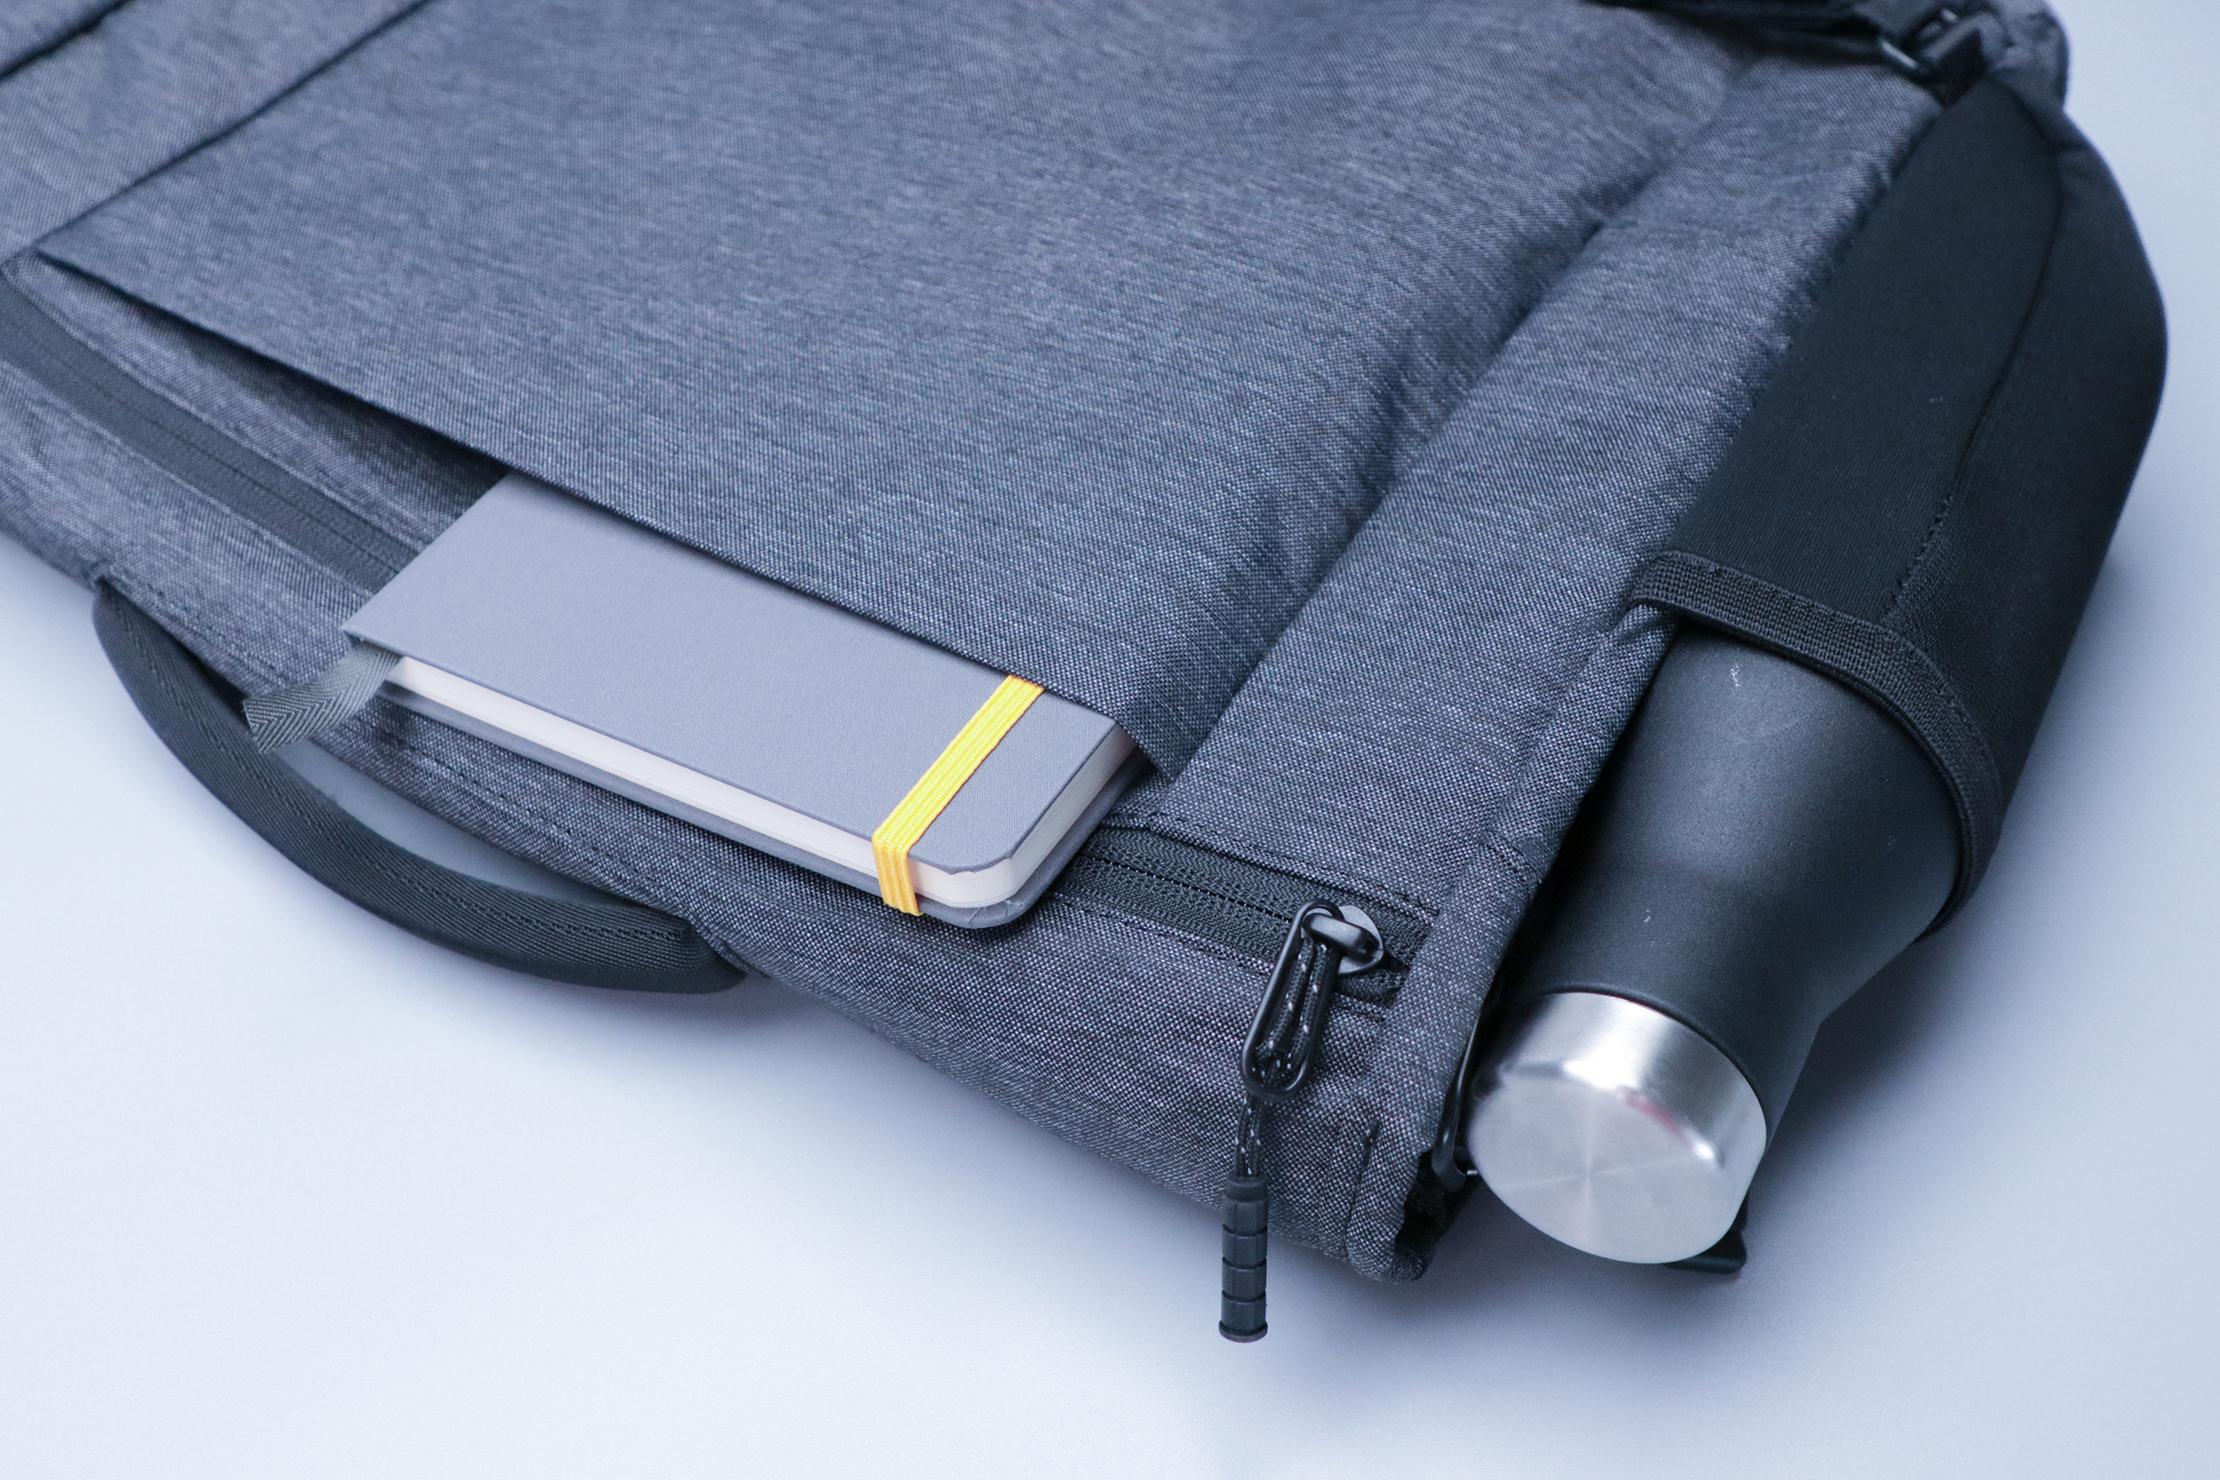 Timbuk2 Closer Laptop Briefcase Luggage Passthrough Water Bottle Pocket